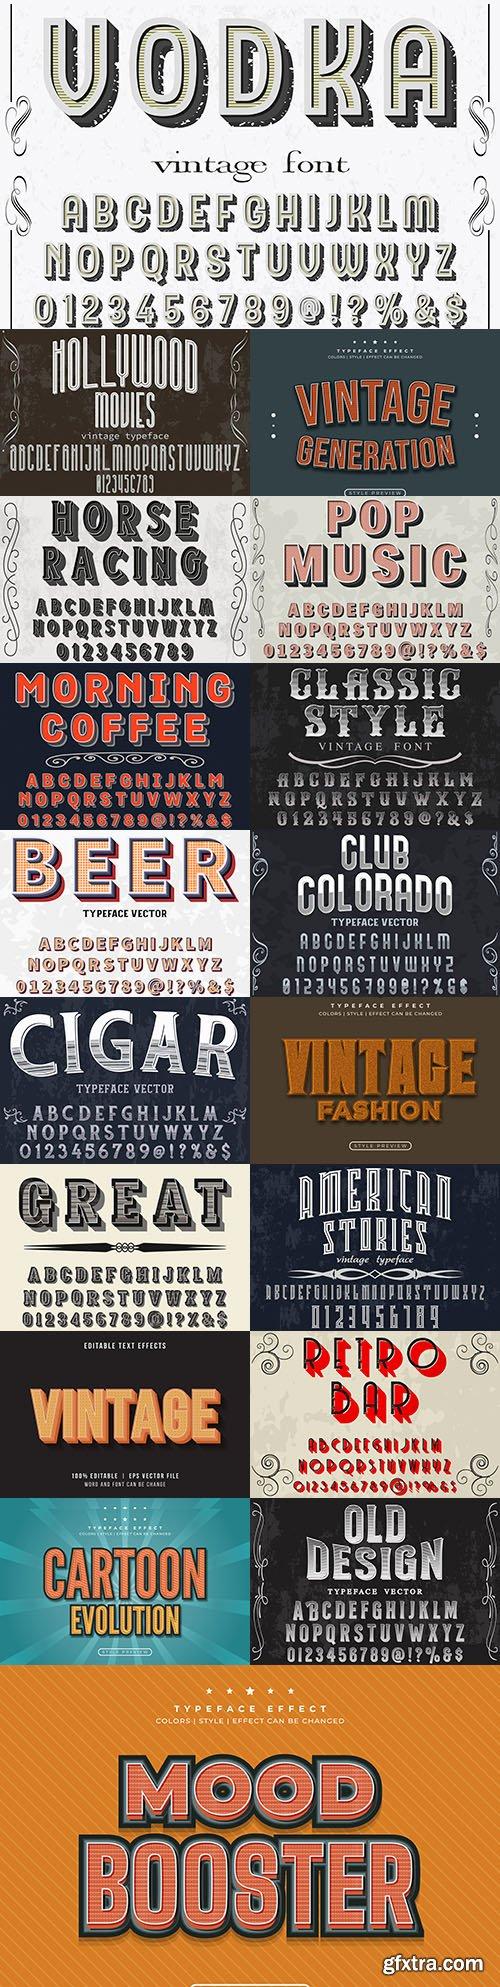 Vintage editable font and alphabet collection illustration design 5